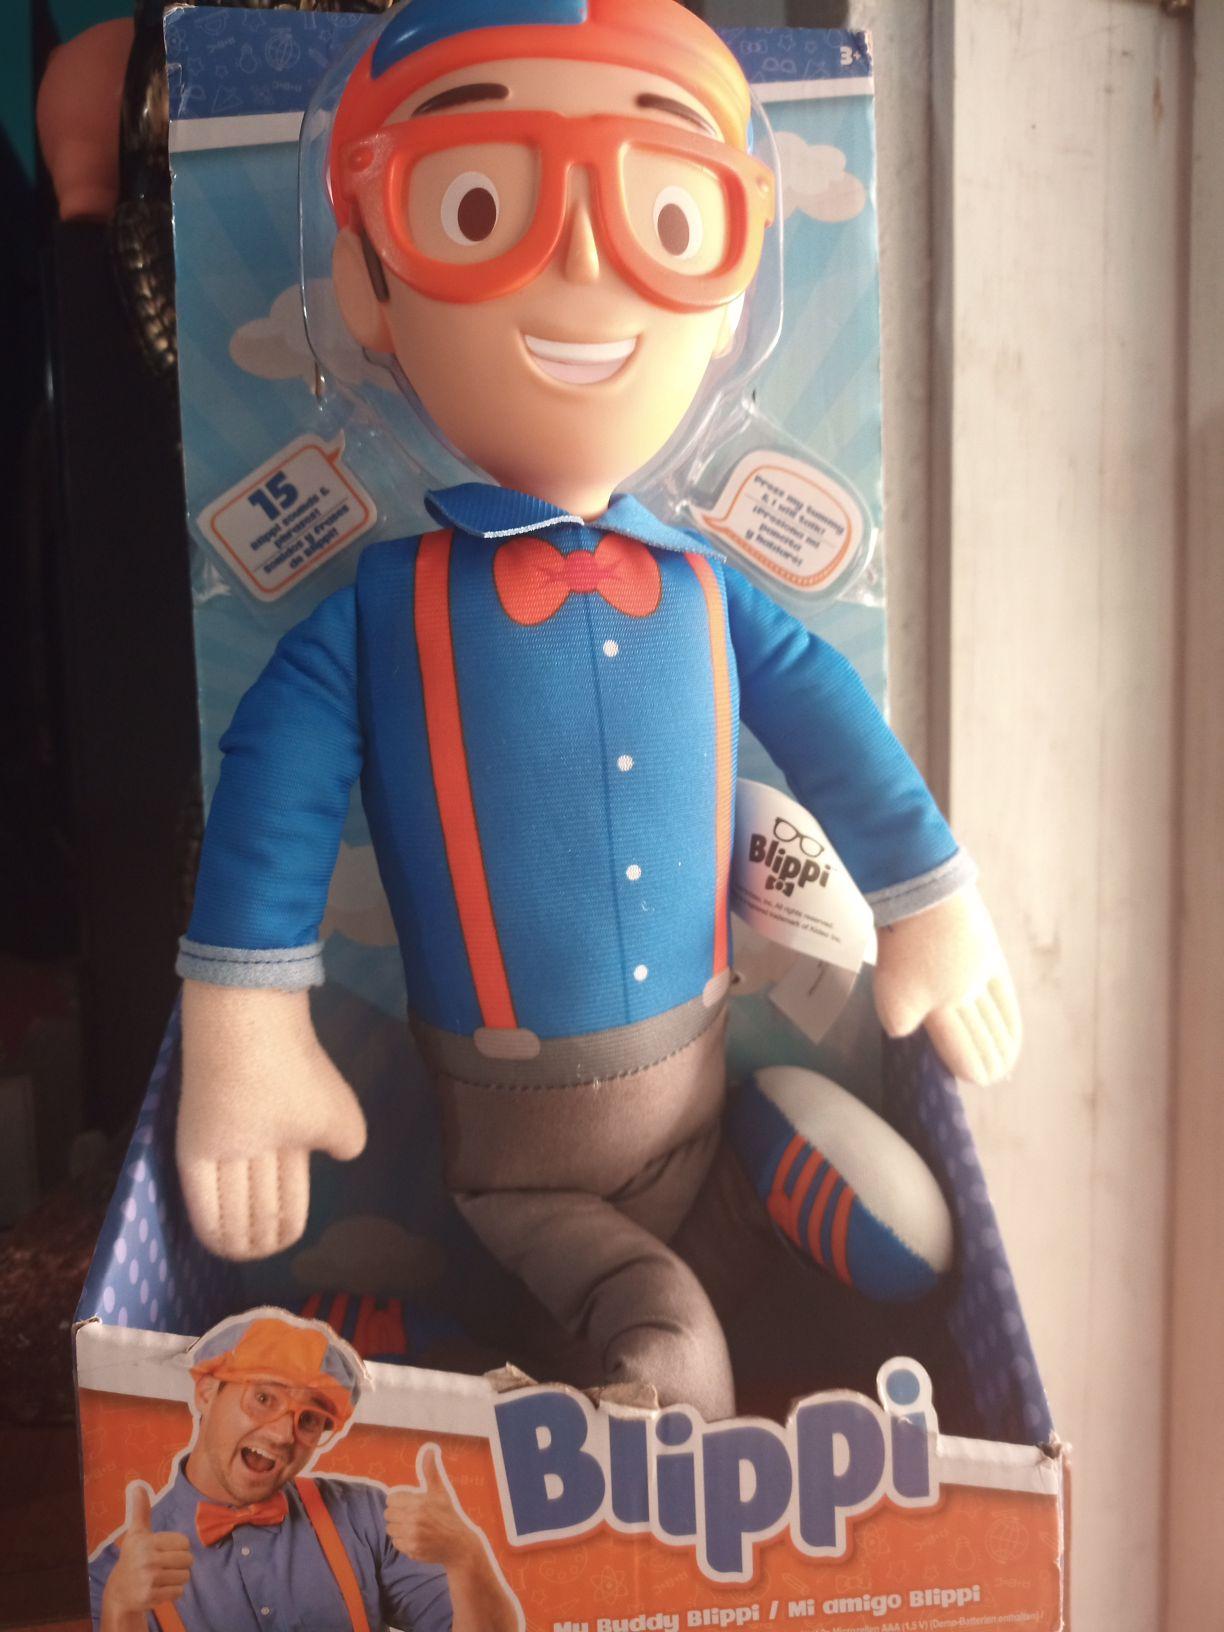 Walmart muñeco del mendigo Blippi